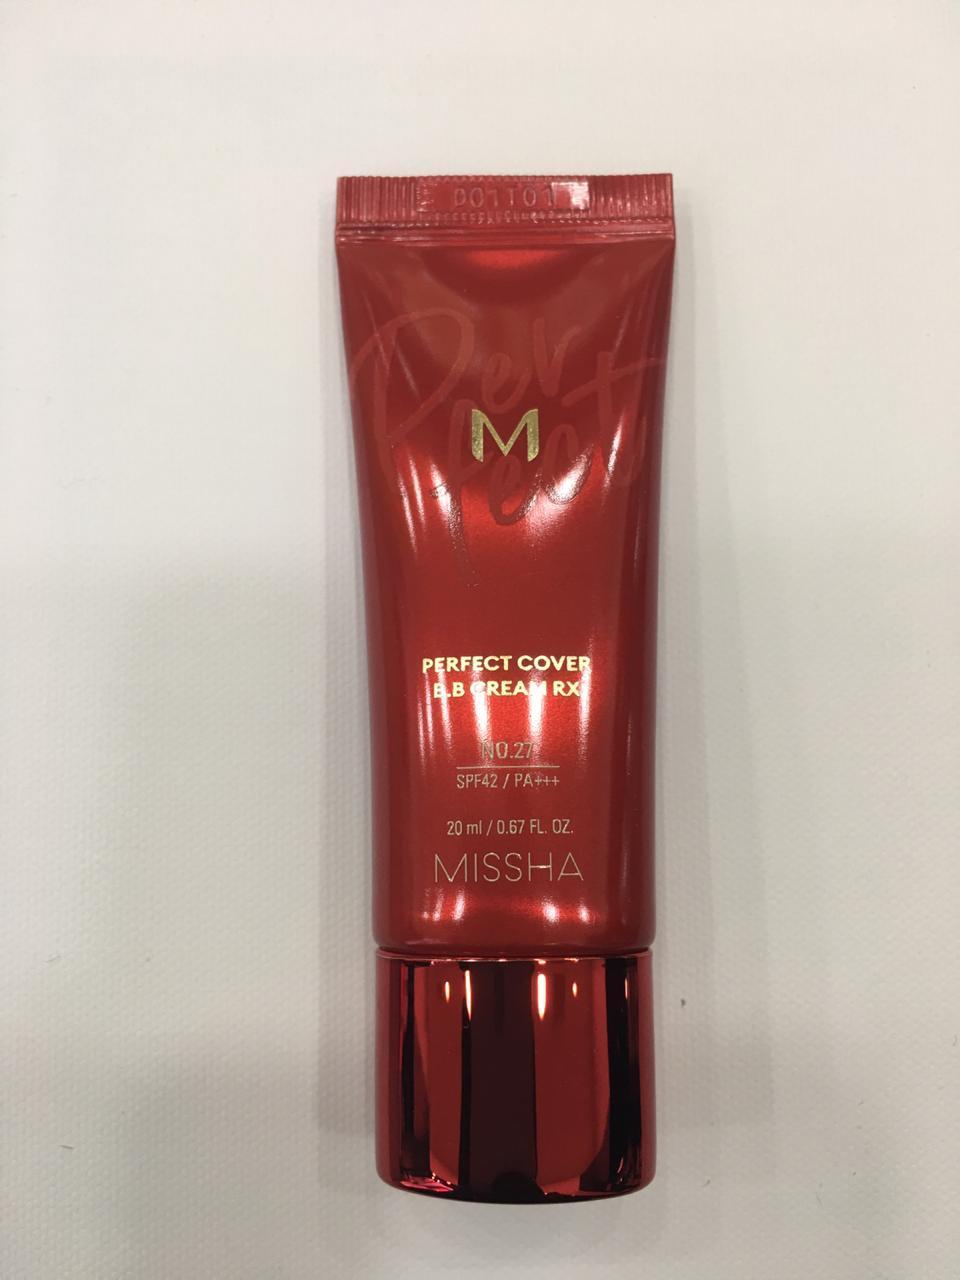 ВВ крем M Perfect Cover BB Cream RX (No.21/Light Beige)